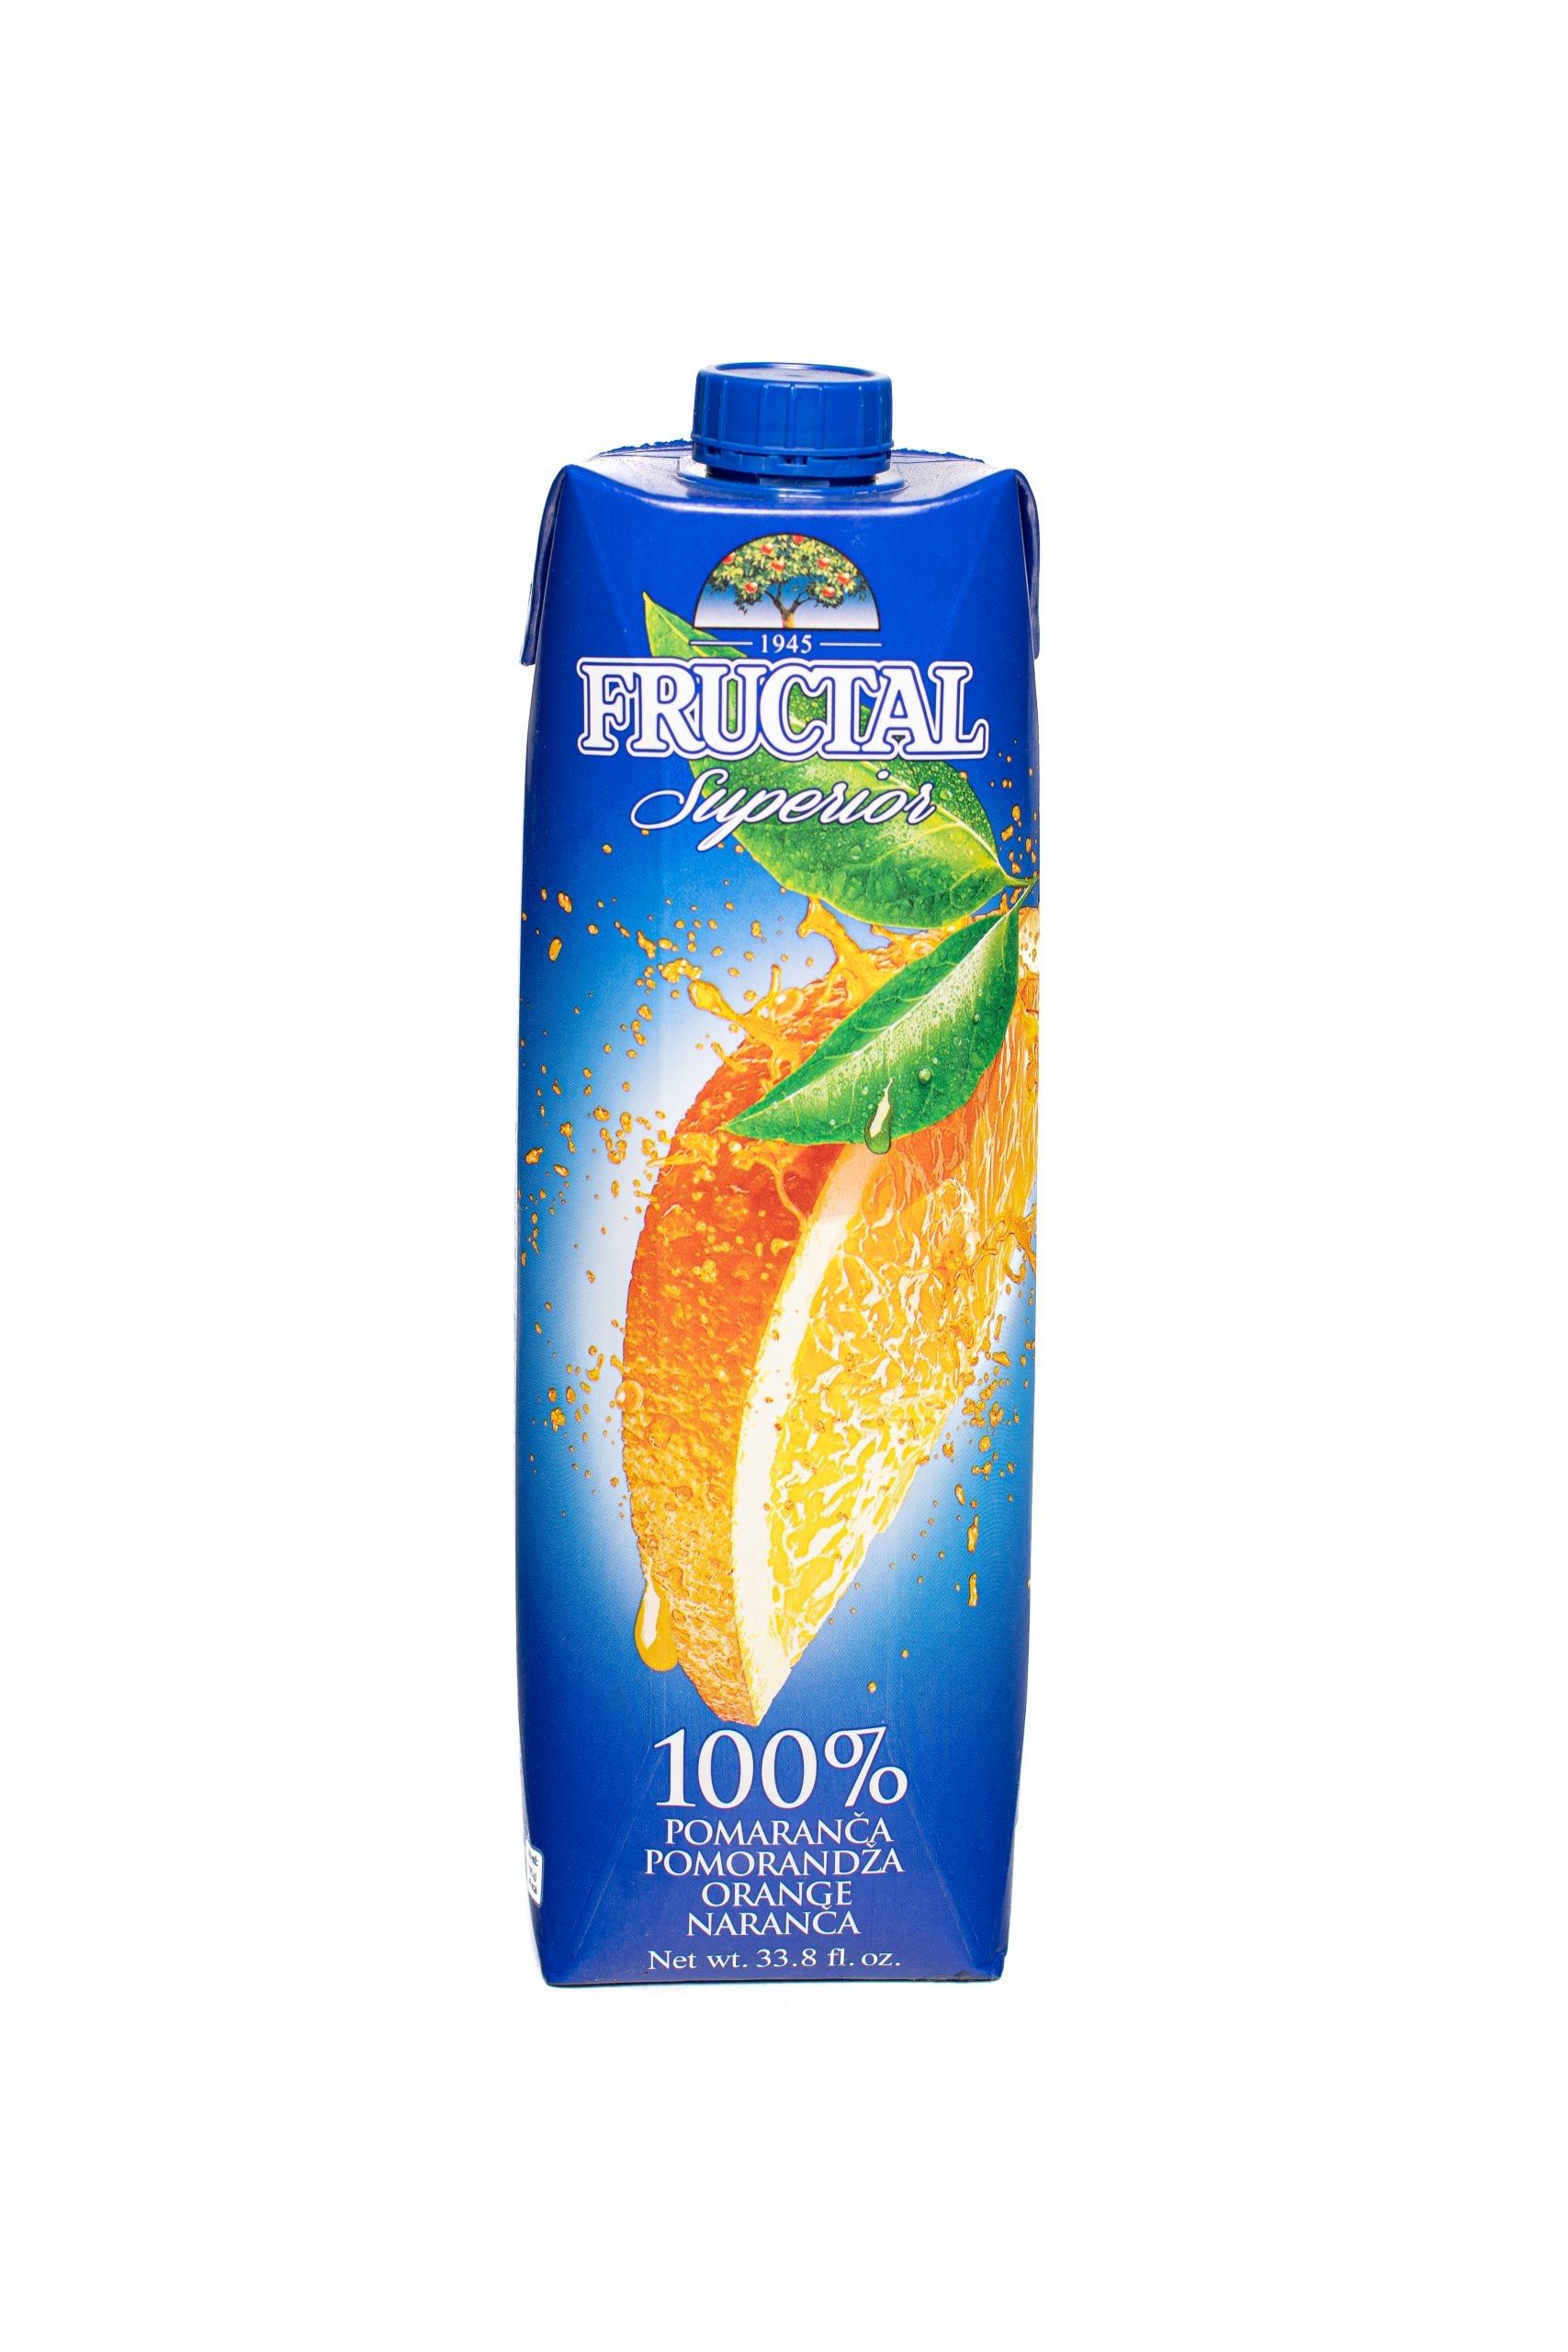 Fructal Superior | 1L | Orange